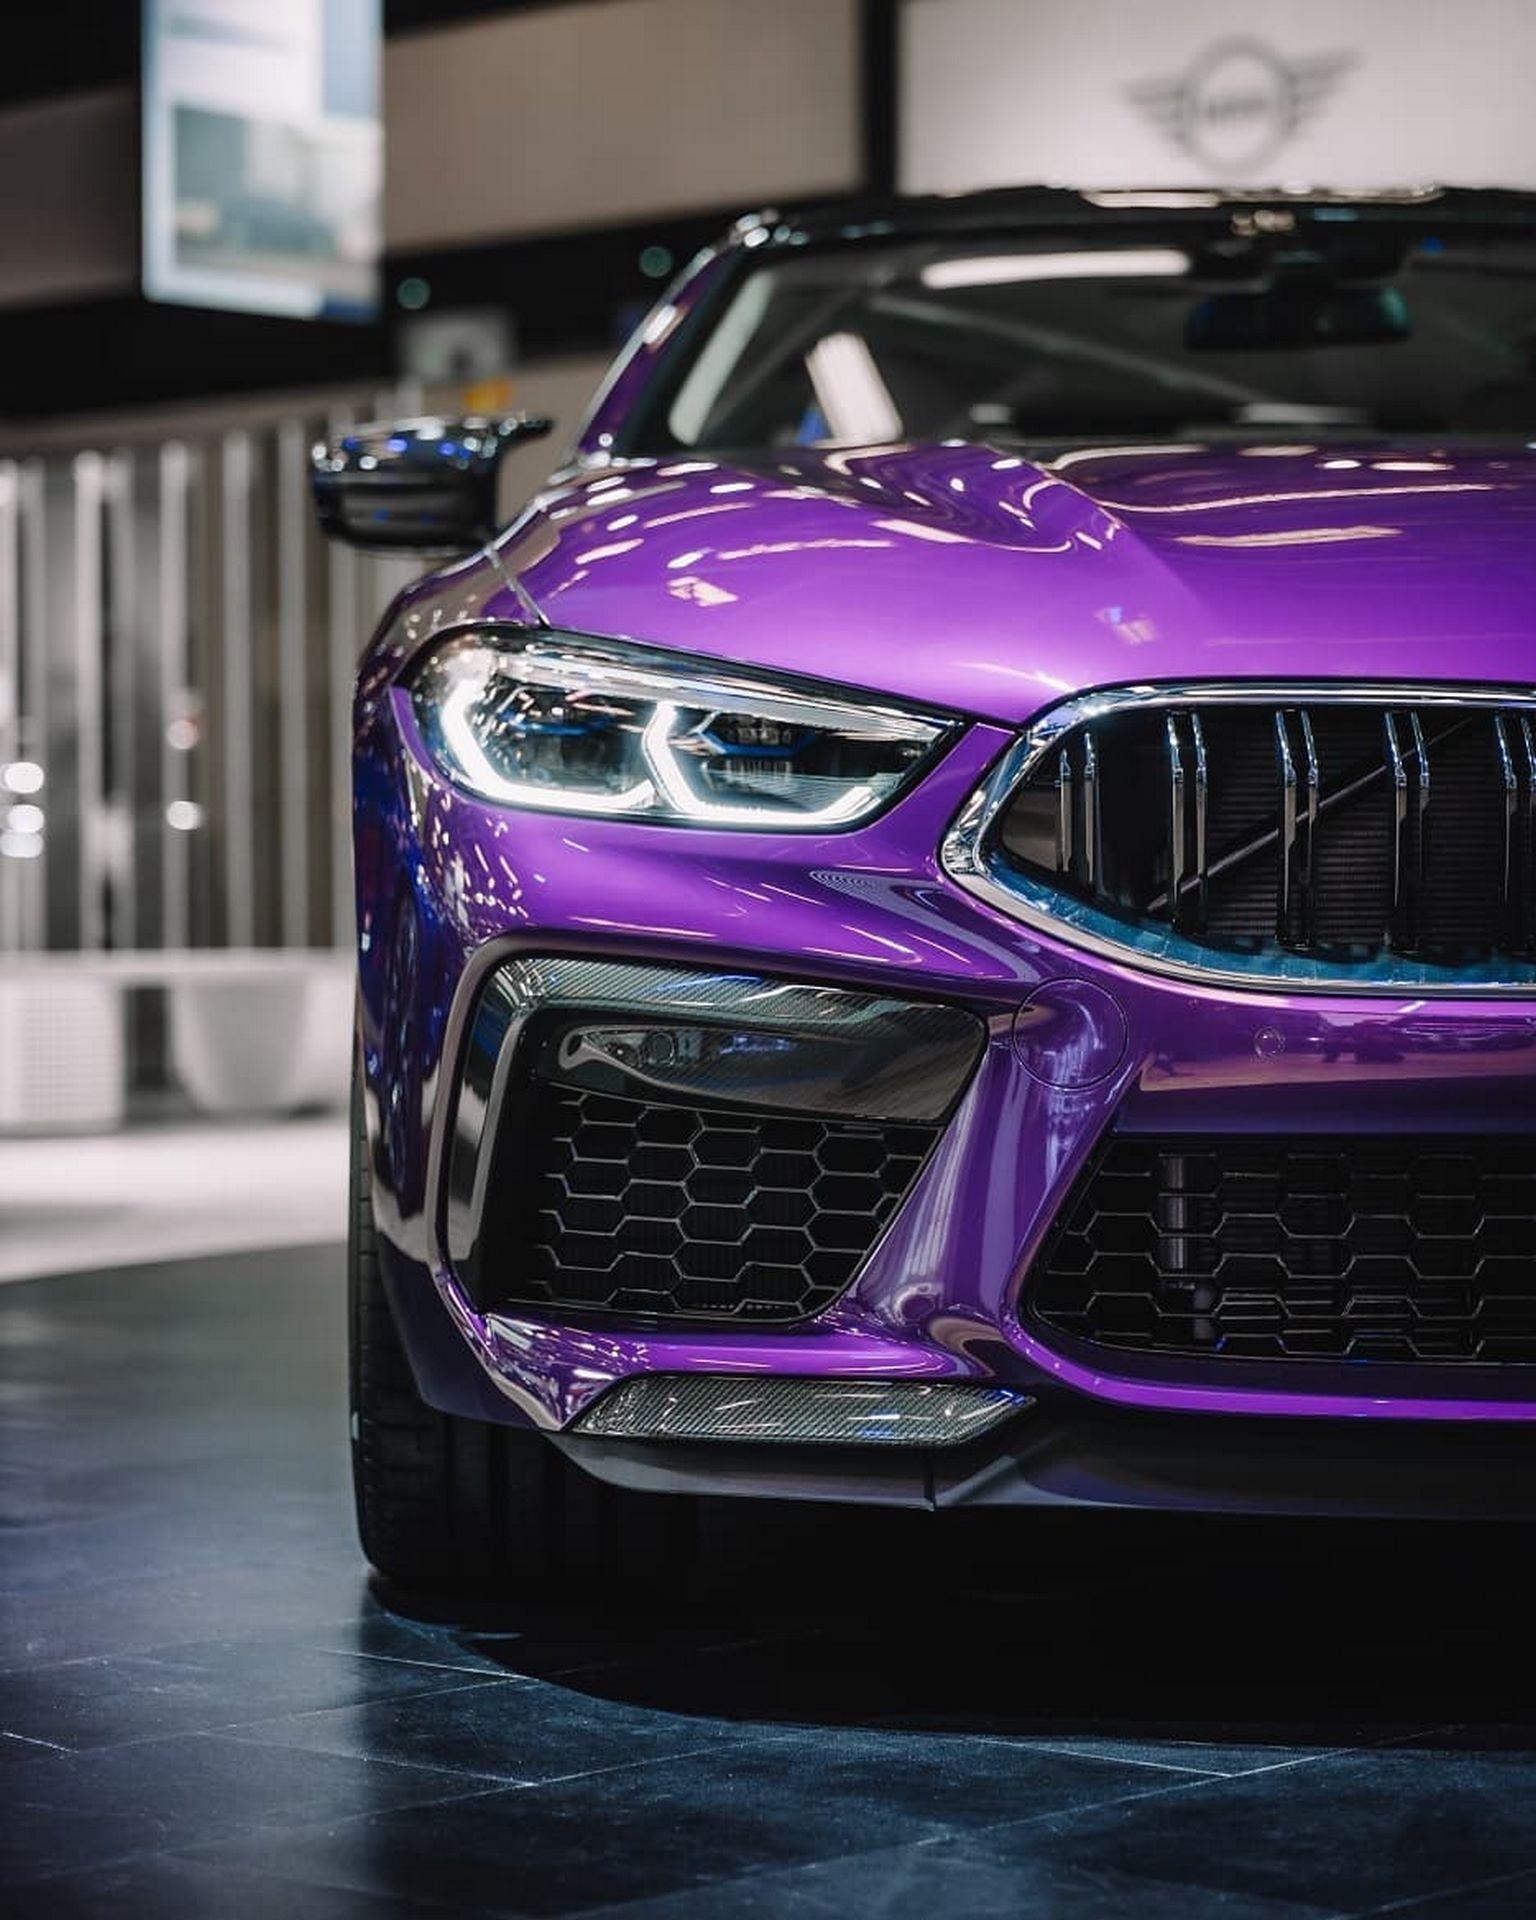 BMW-M8-Gran-Coupe-Twilight-Purple-3